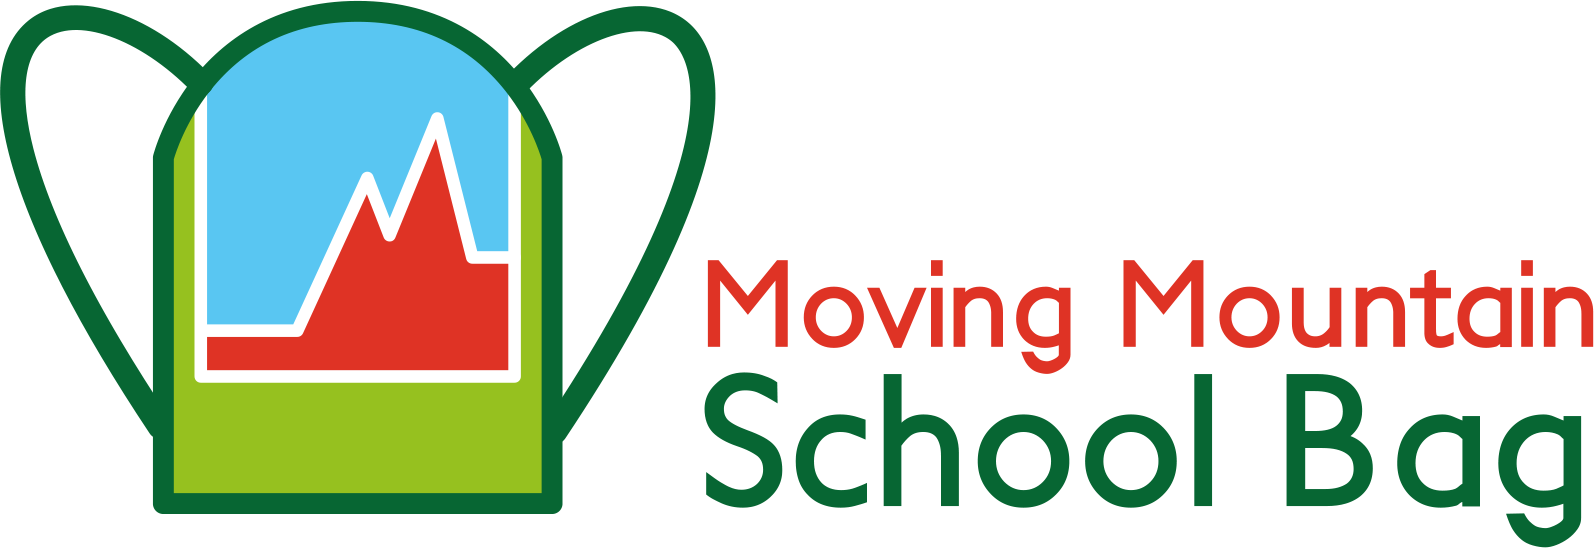 Tarja Petrell's Moving Mountain School Bag logo